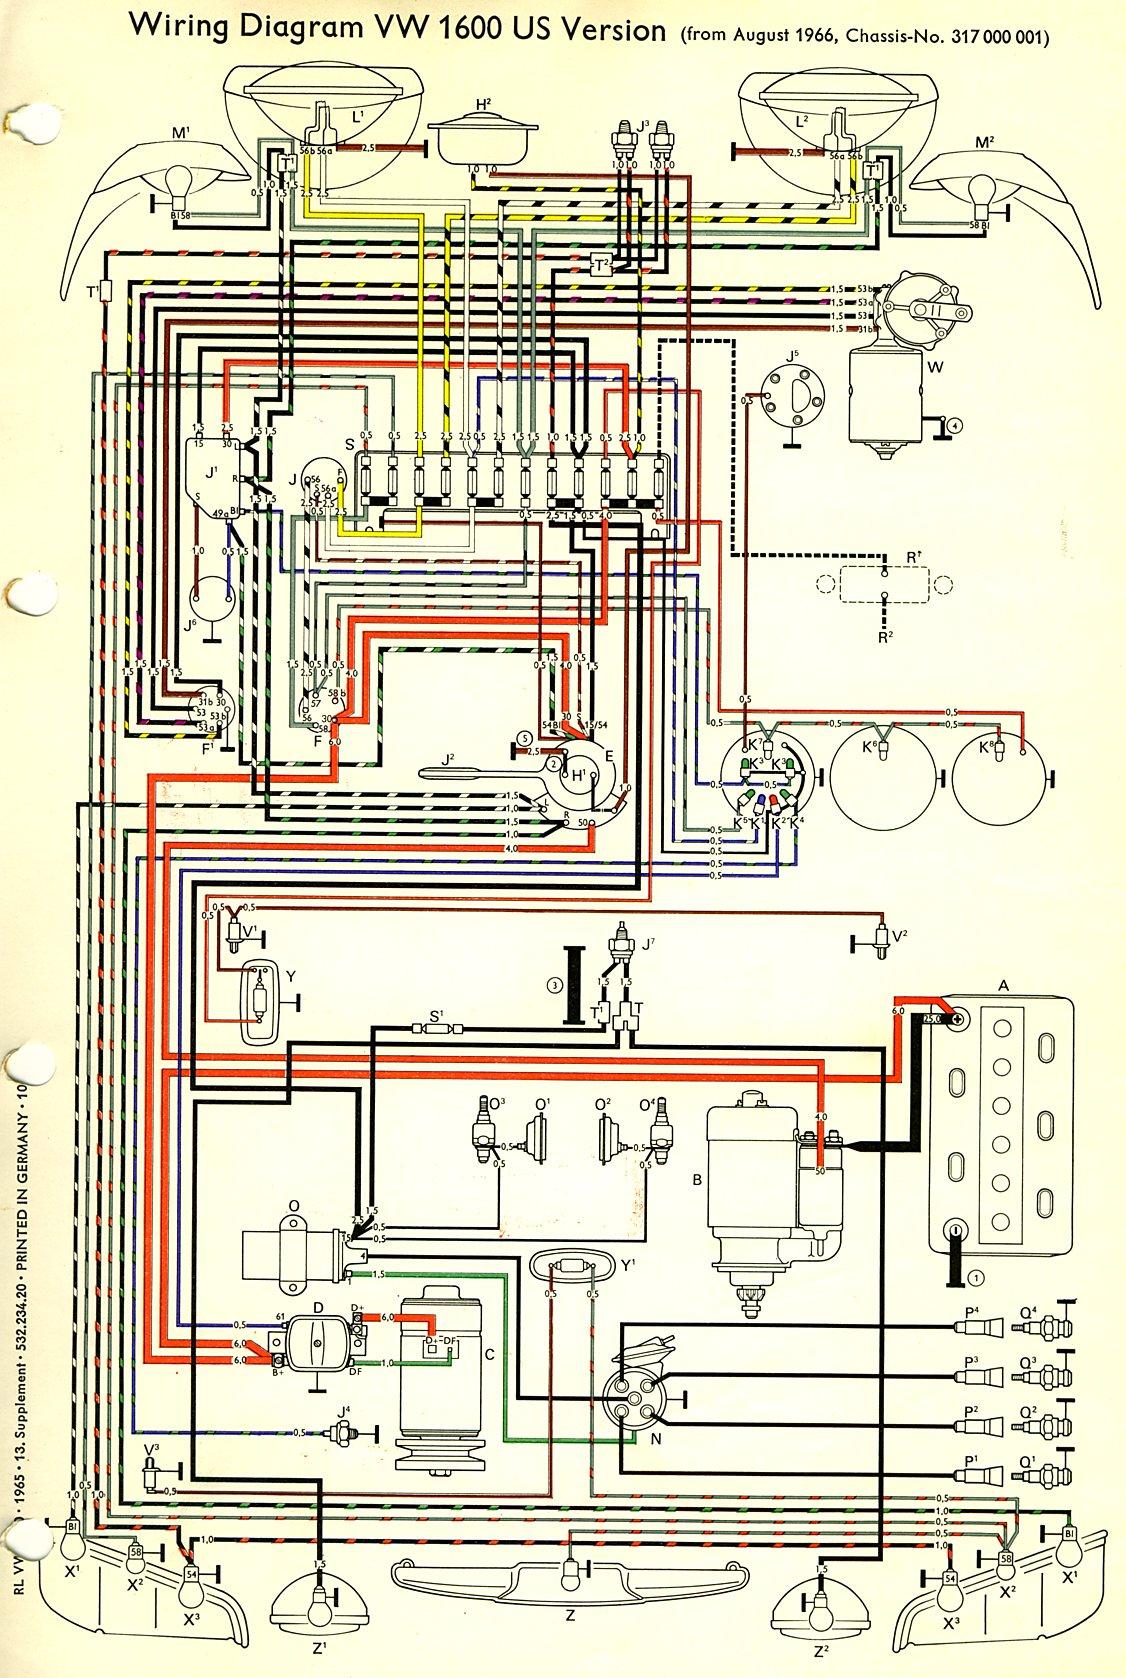 hight resolution of thesamba com type 3 wiring diagrams wiring diagram vw type 3 notchback 1965